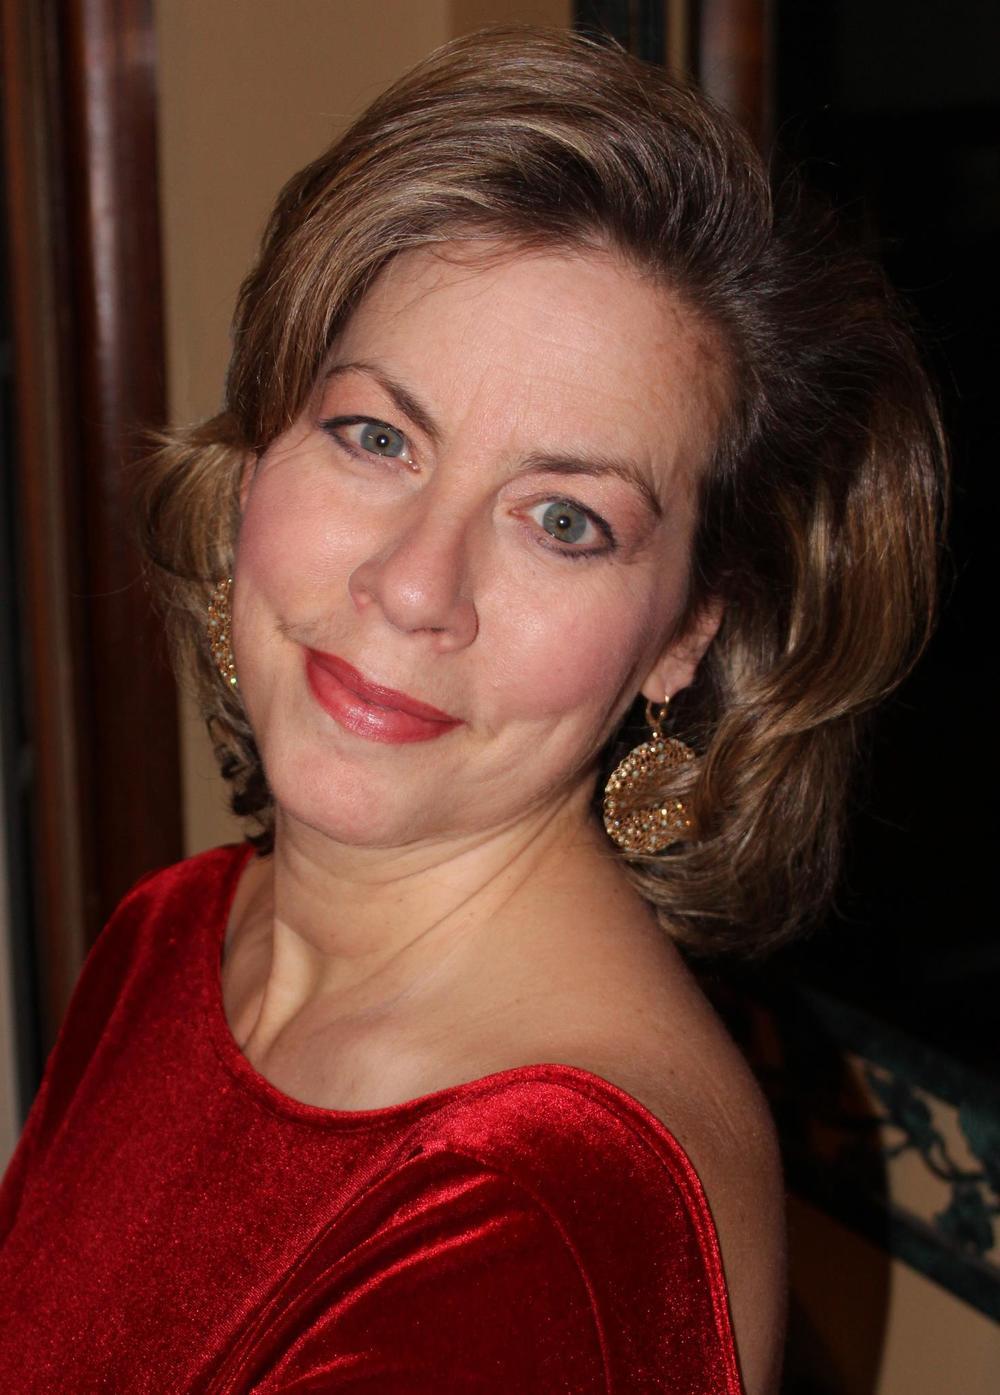 Soprano Suzanne Duplantis